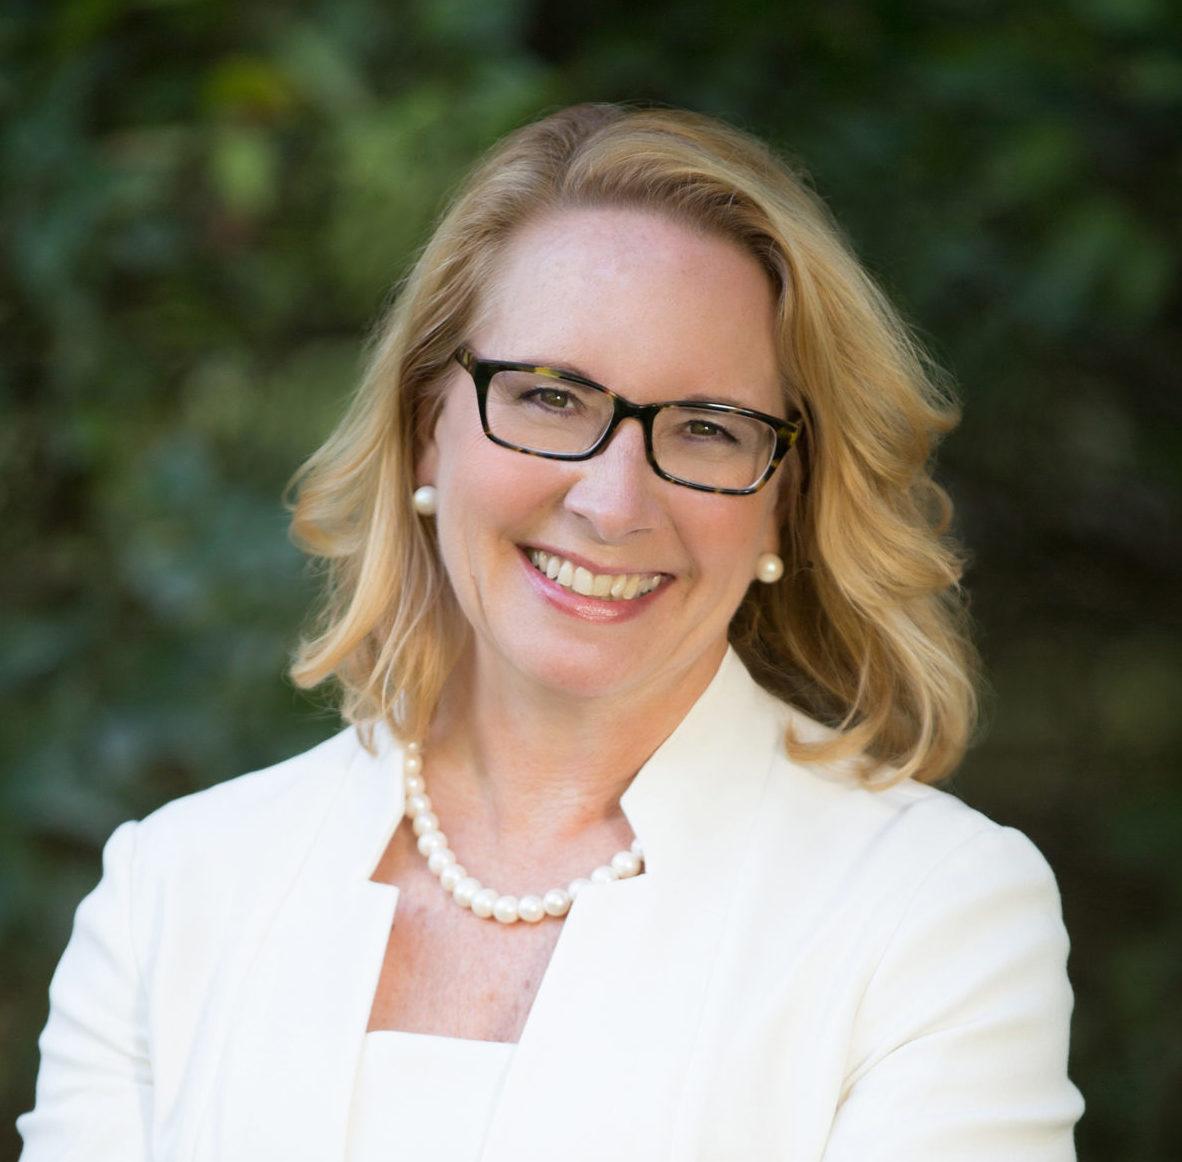 Susan Pastore, Director, Business Development